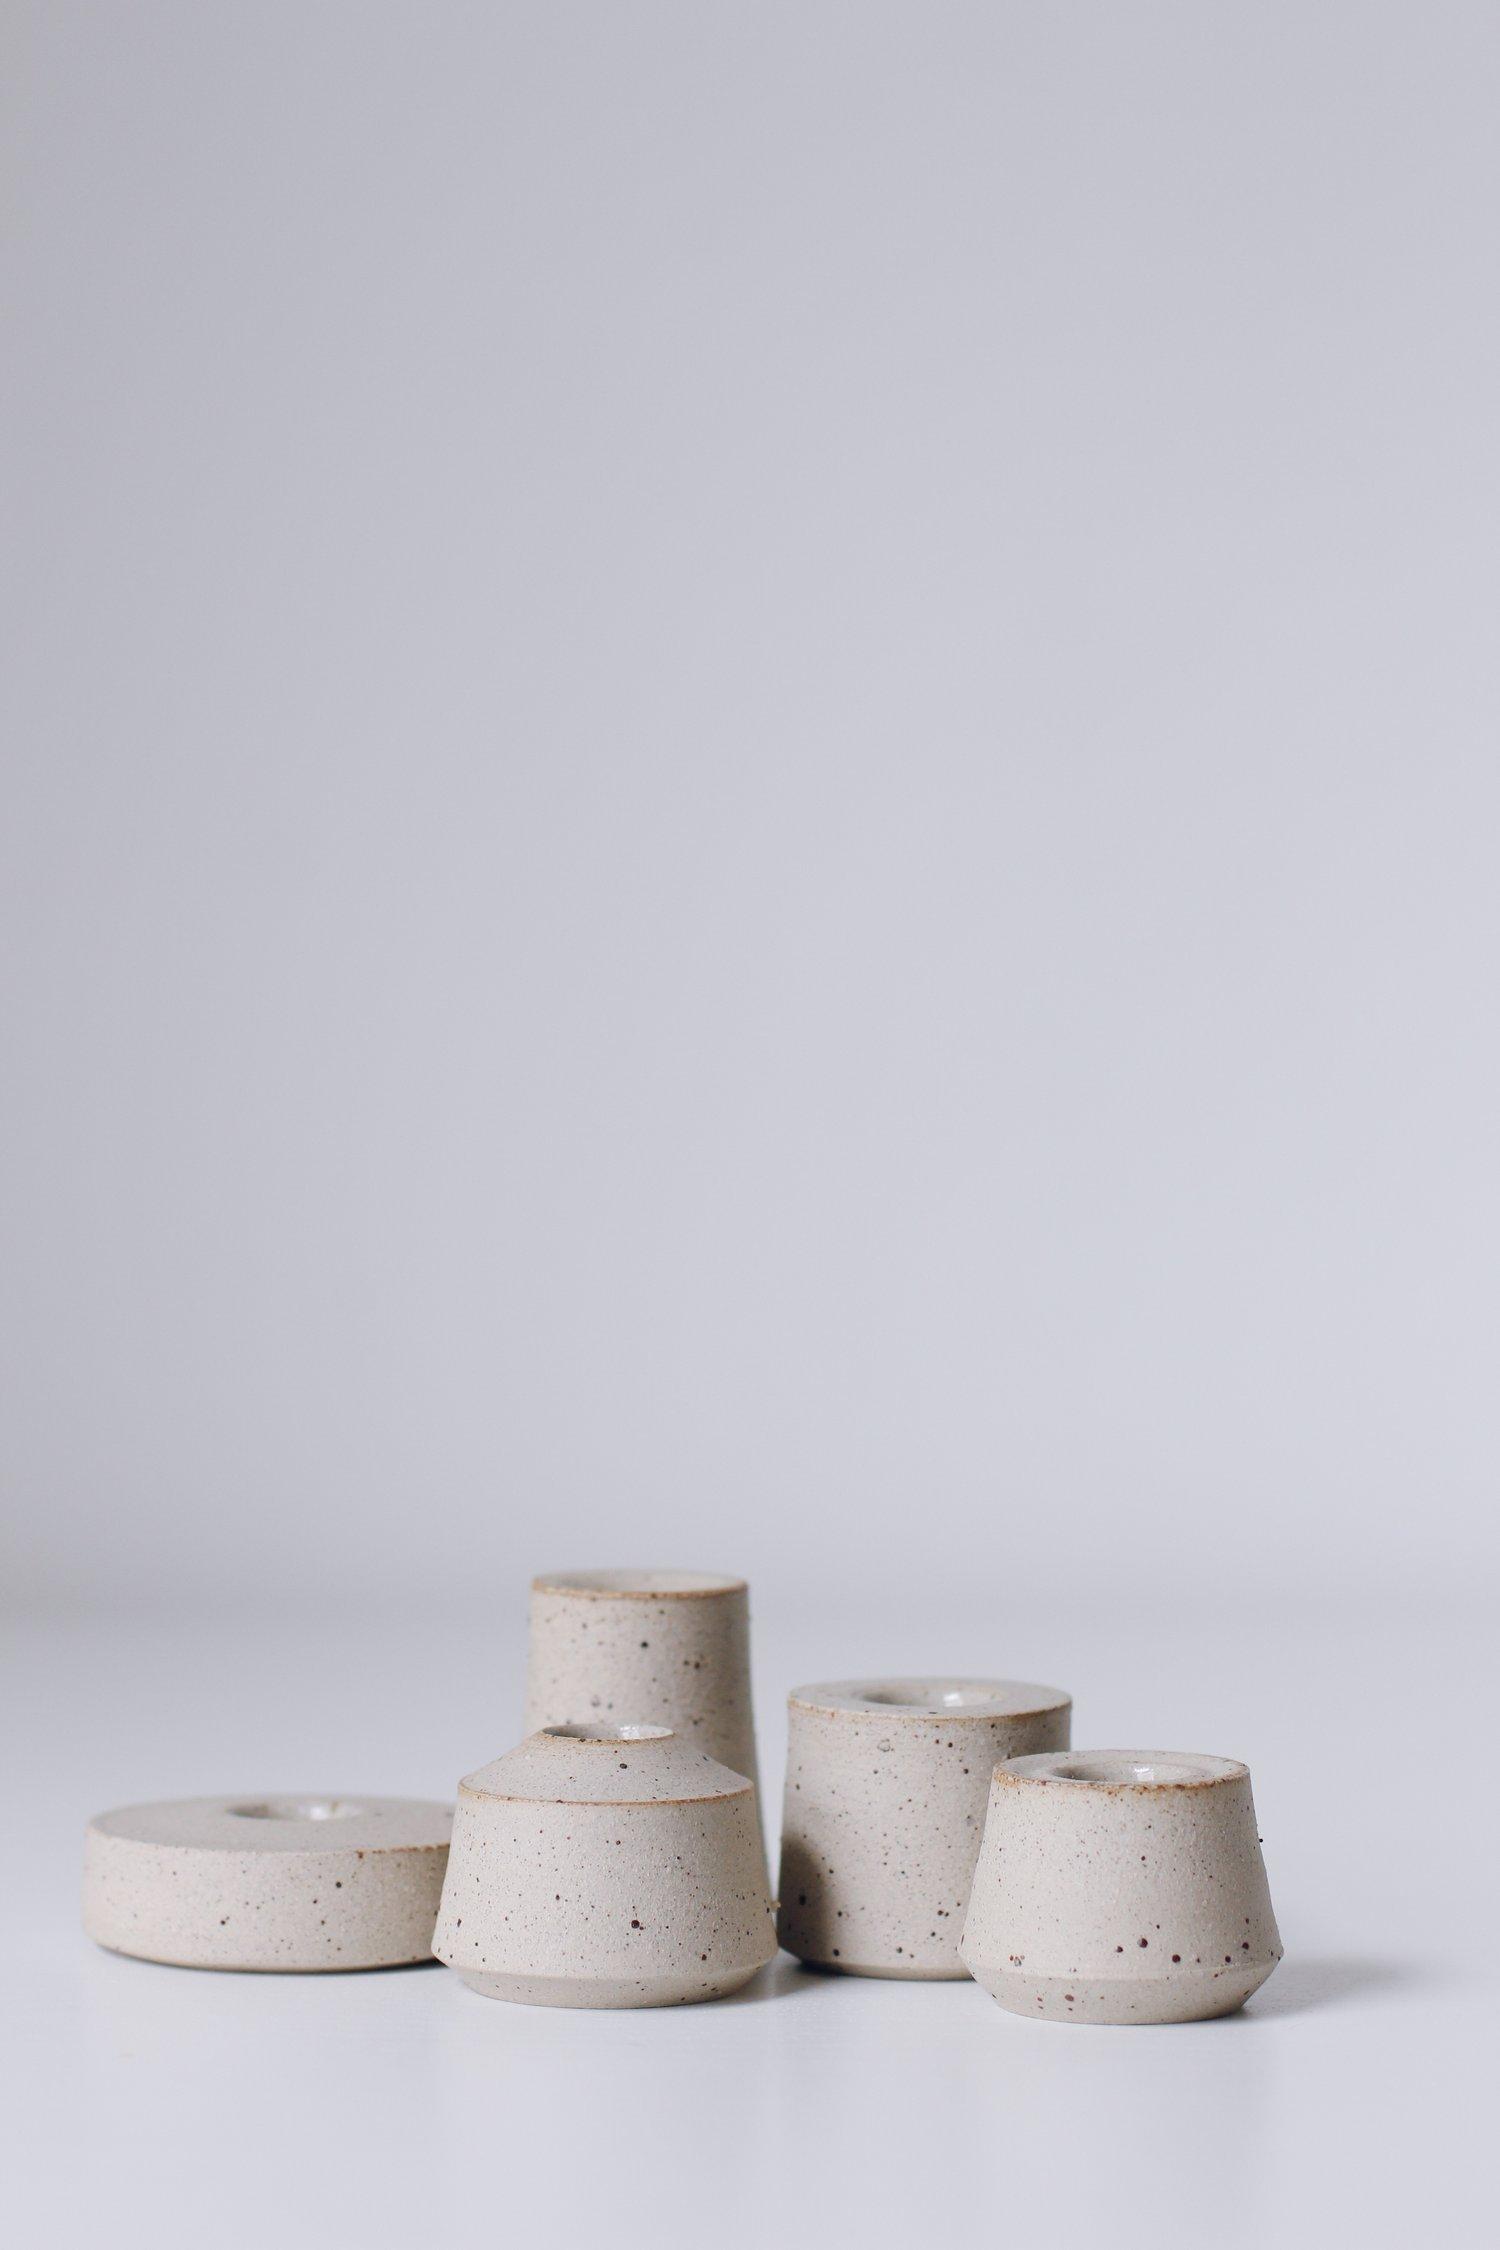 Image of Preorder Stacking Candleholder